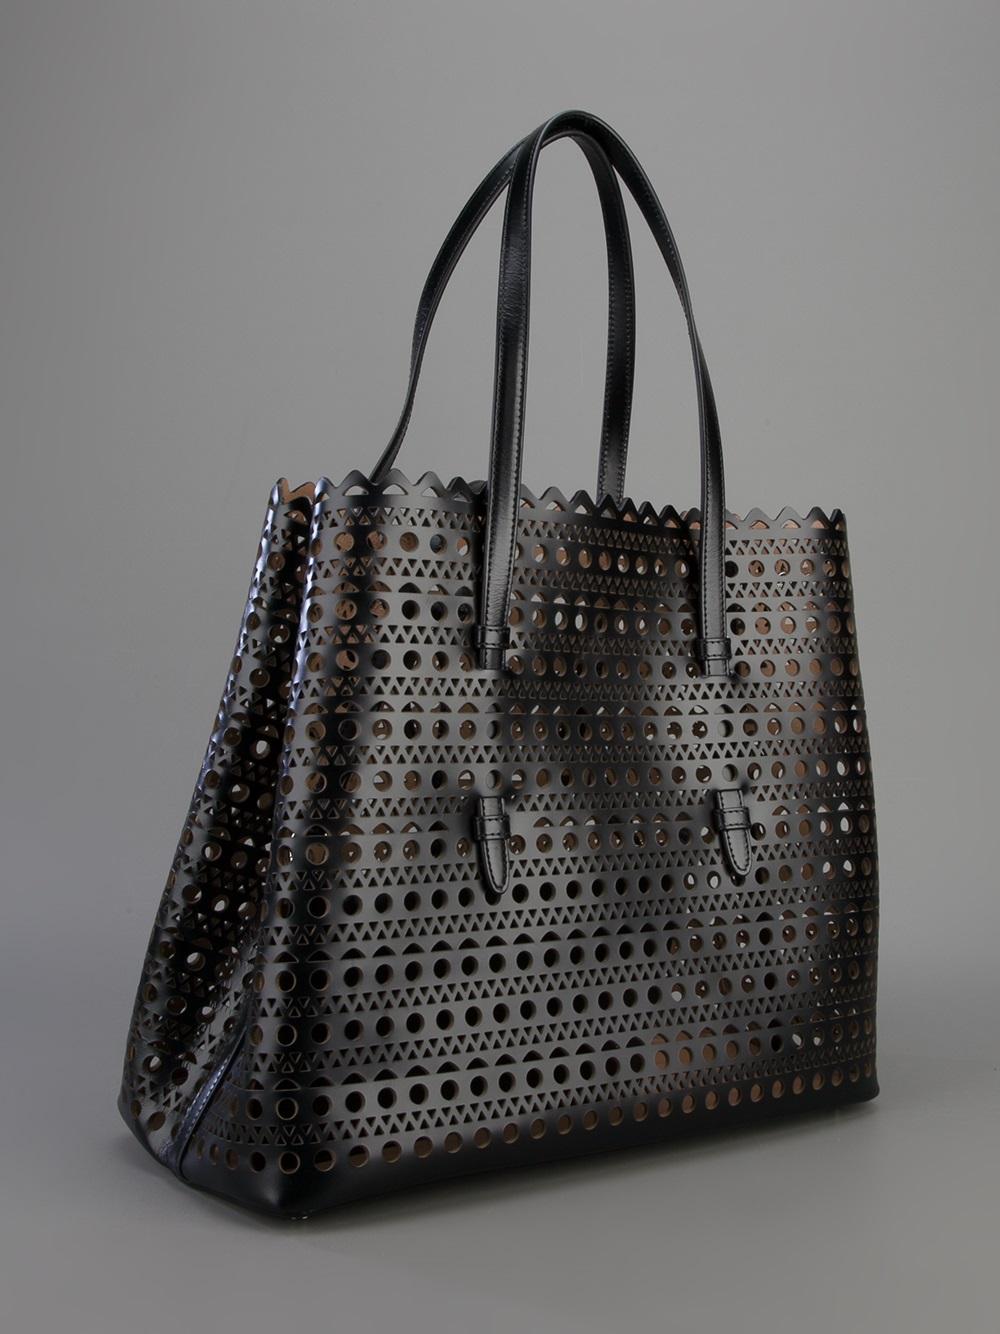 Alaia Black and white medium laser-cut bag DF8fOc6w9